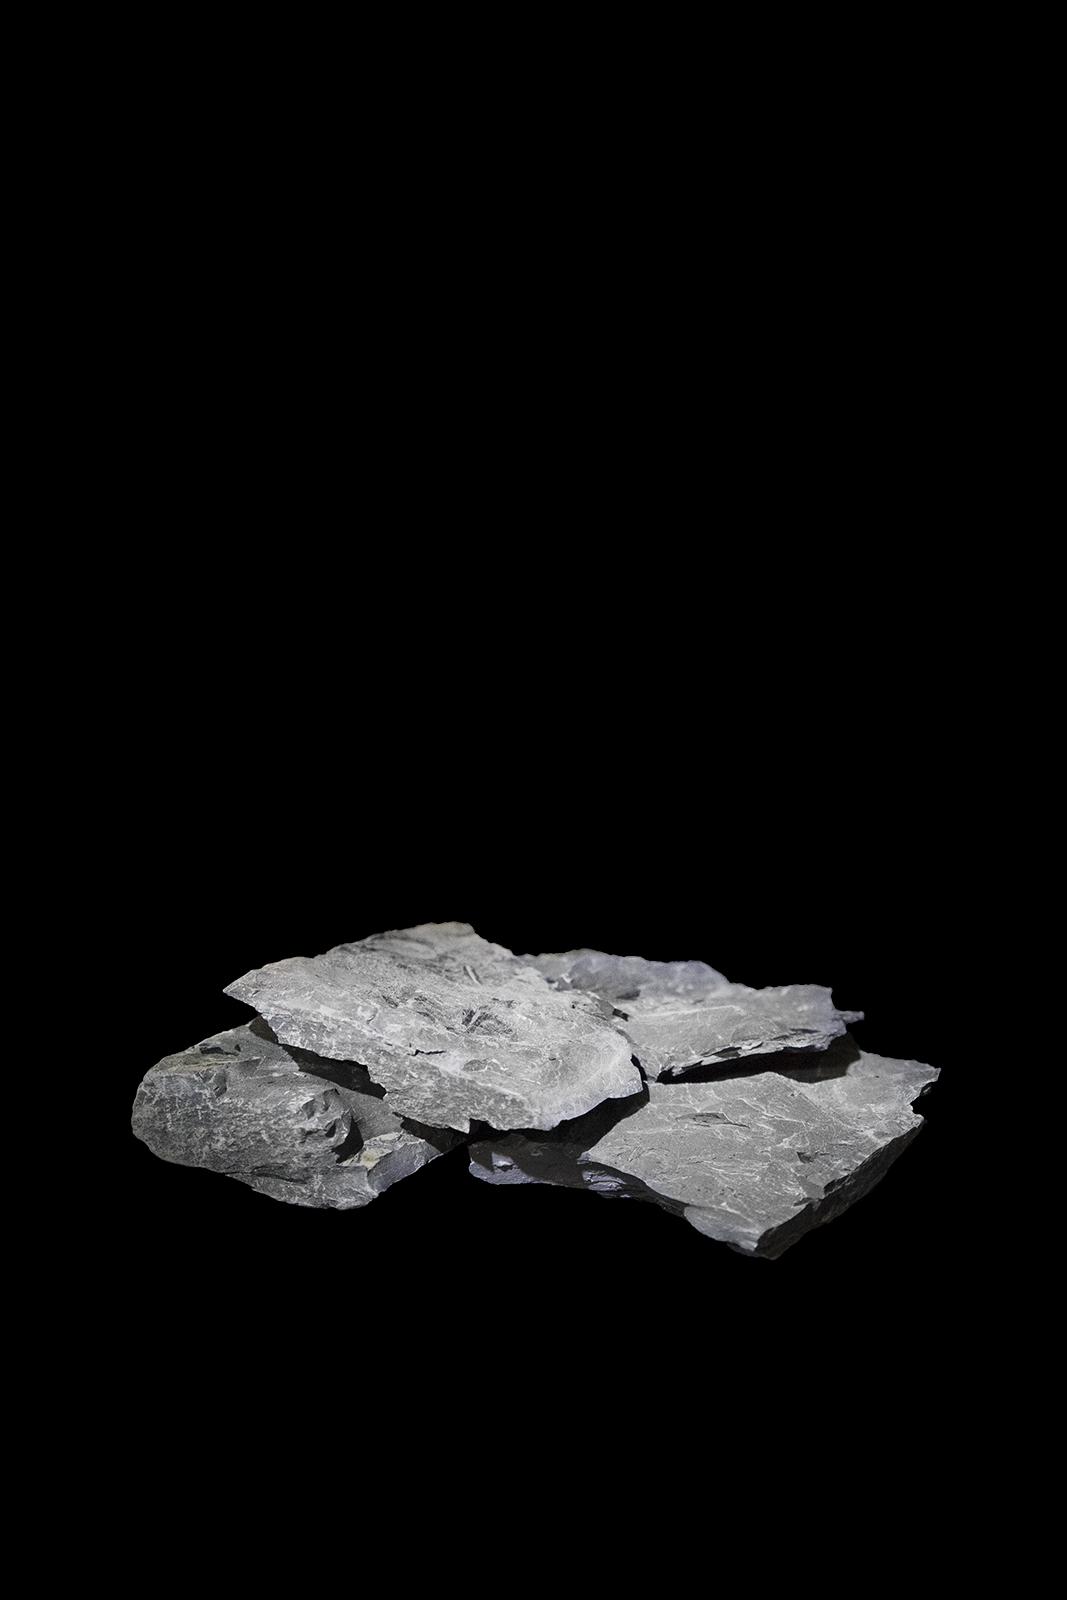 Порожня порода/ Waste rock